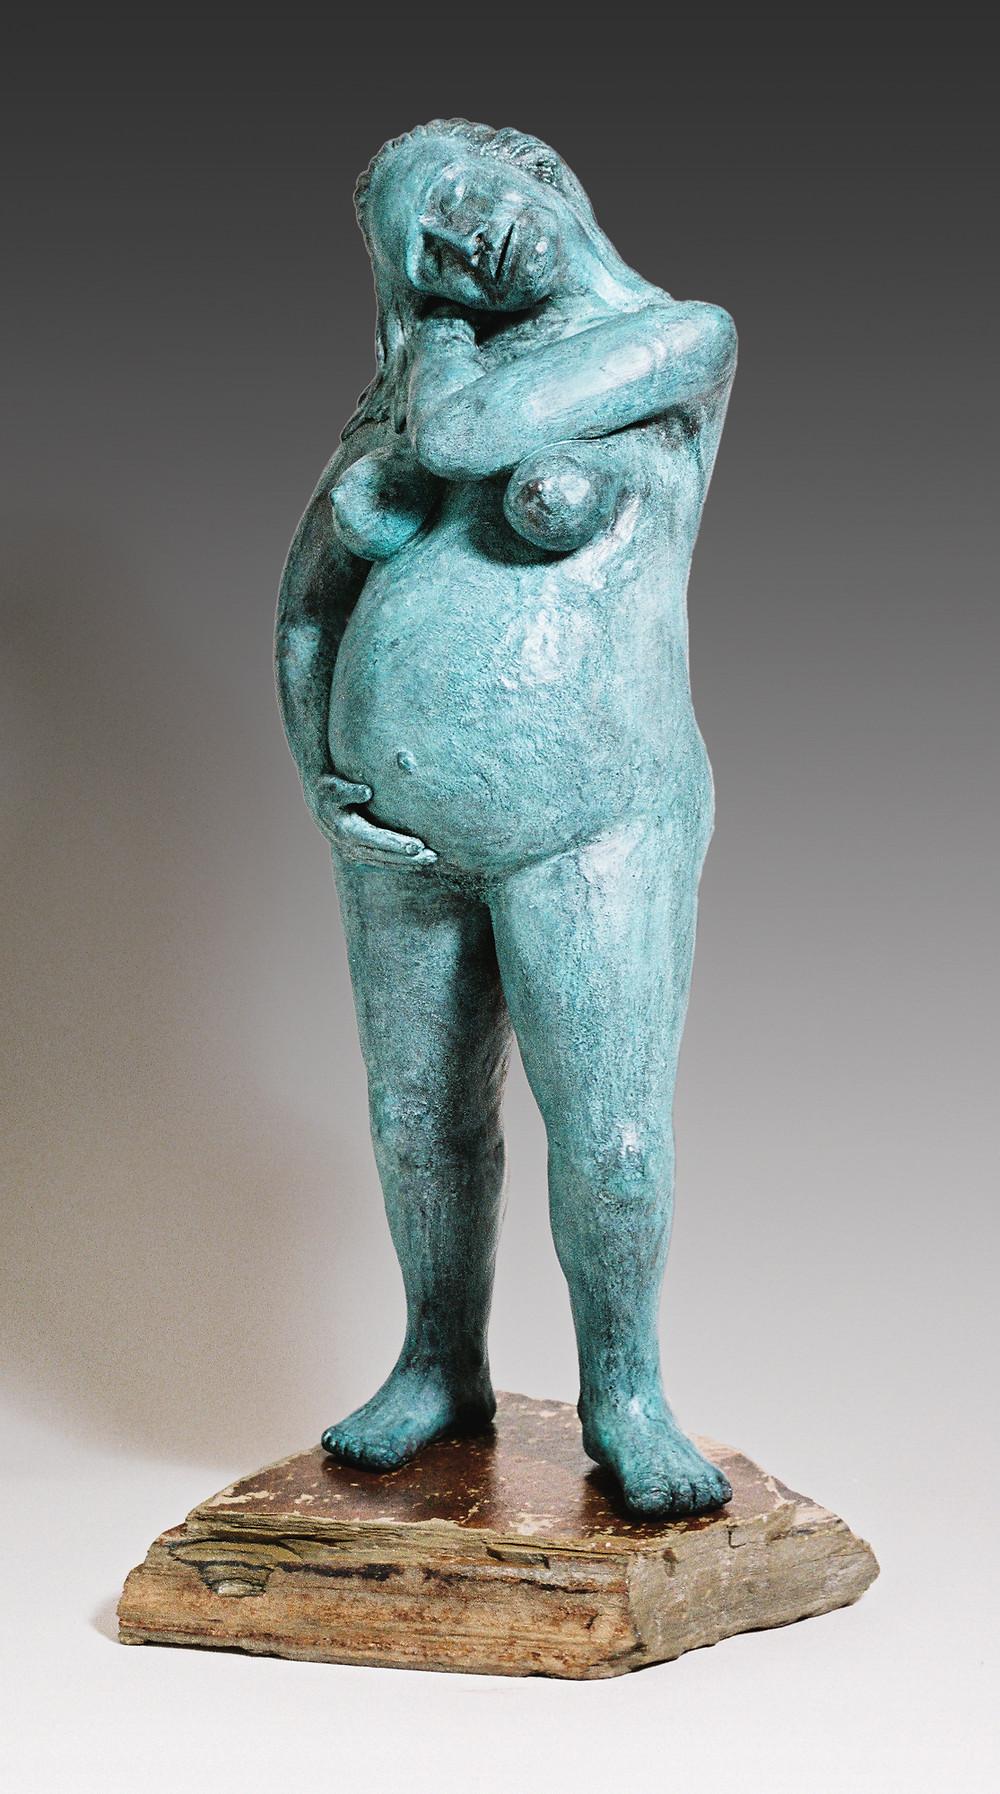 figurative sculpture, pregnant woman, sculpture of pregnant woman